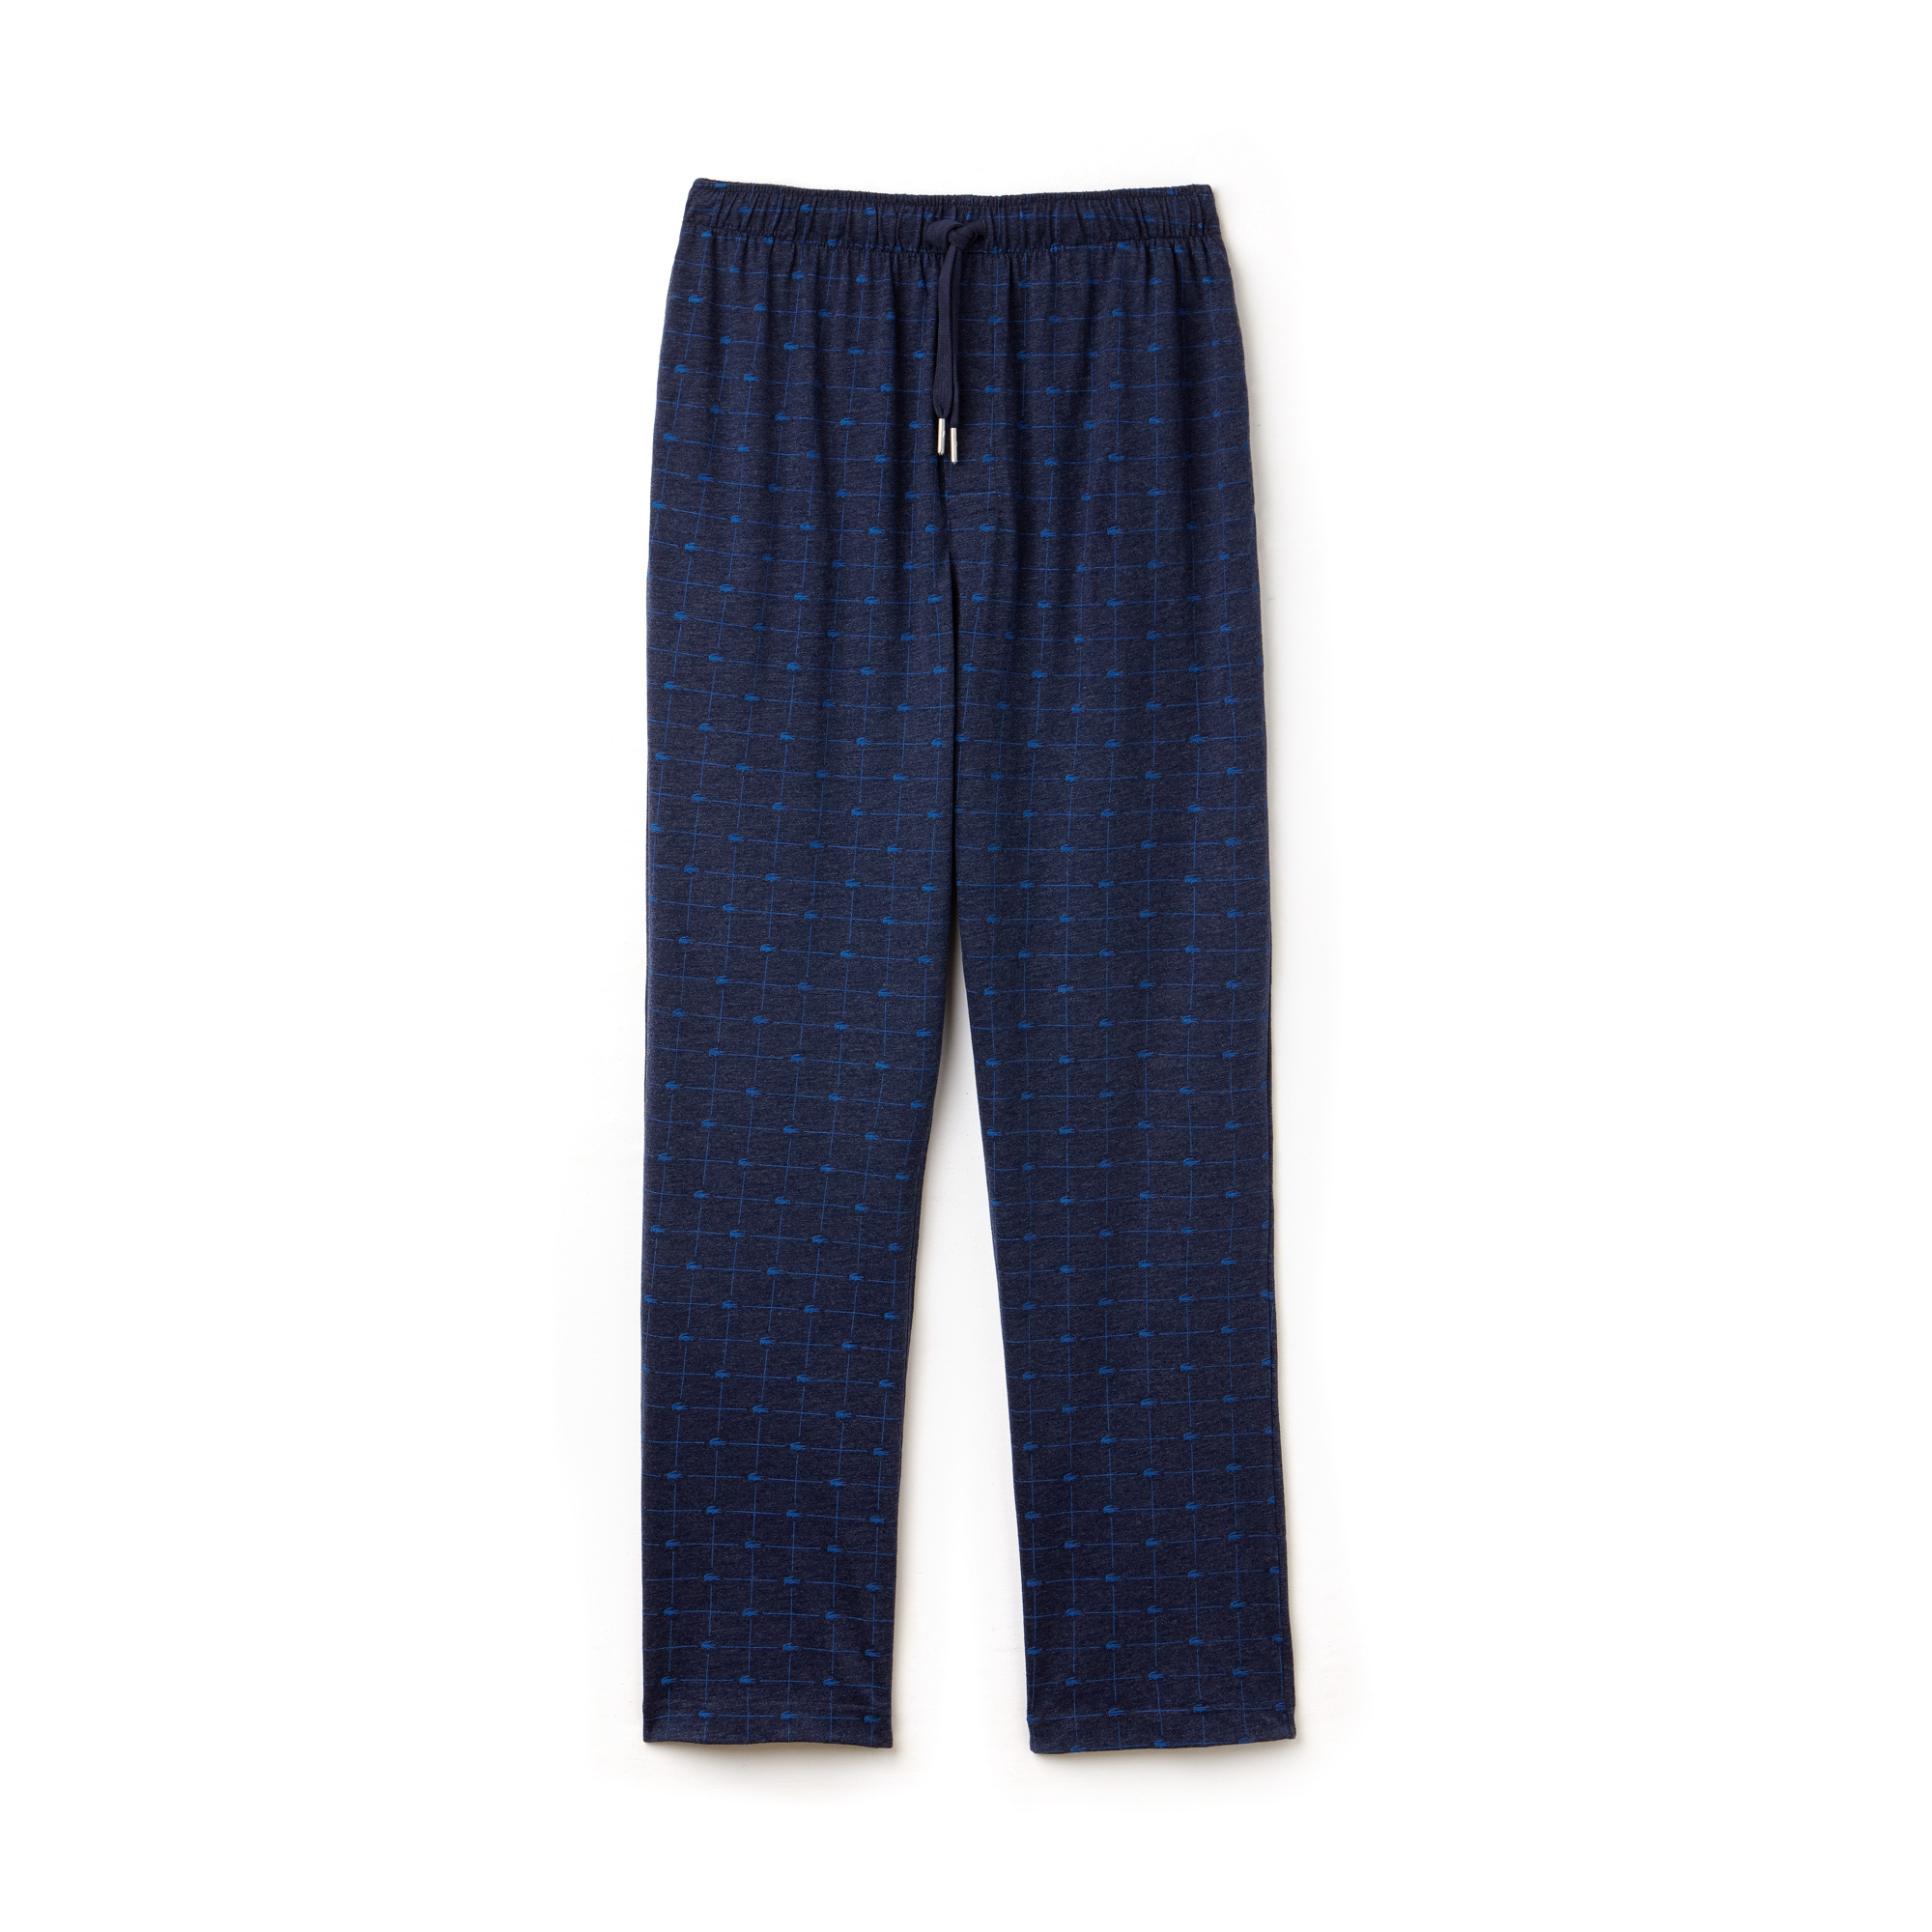 Men's Signature Print Knit Pant